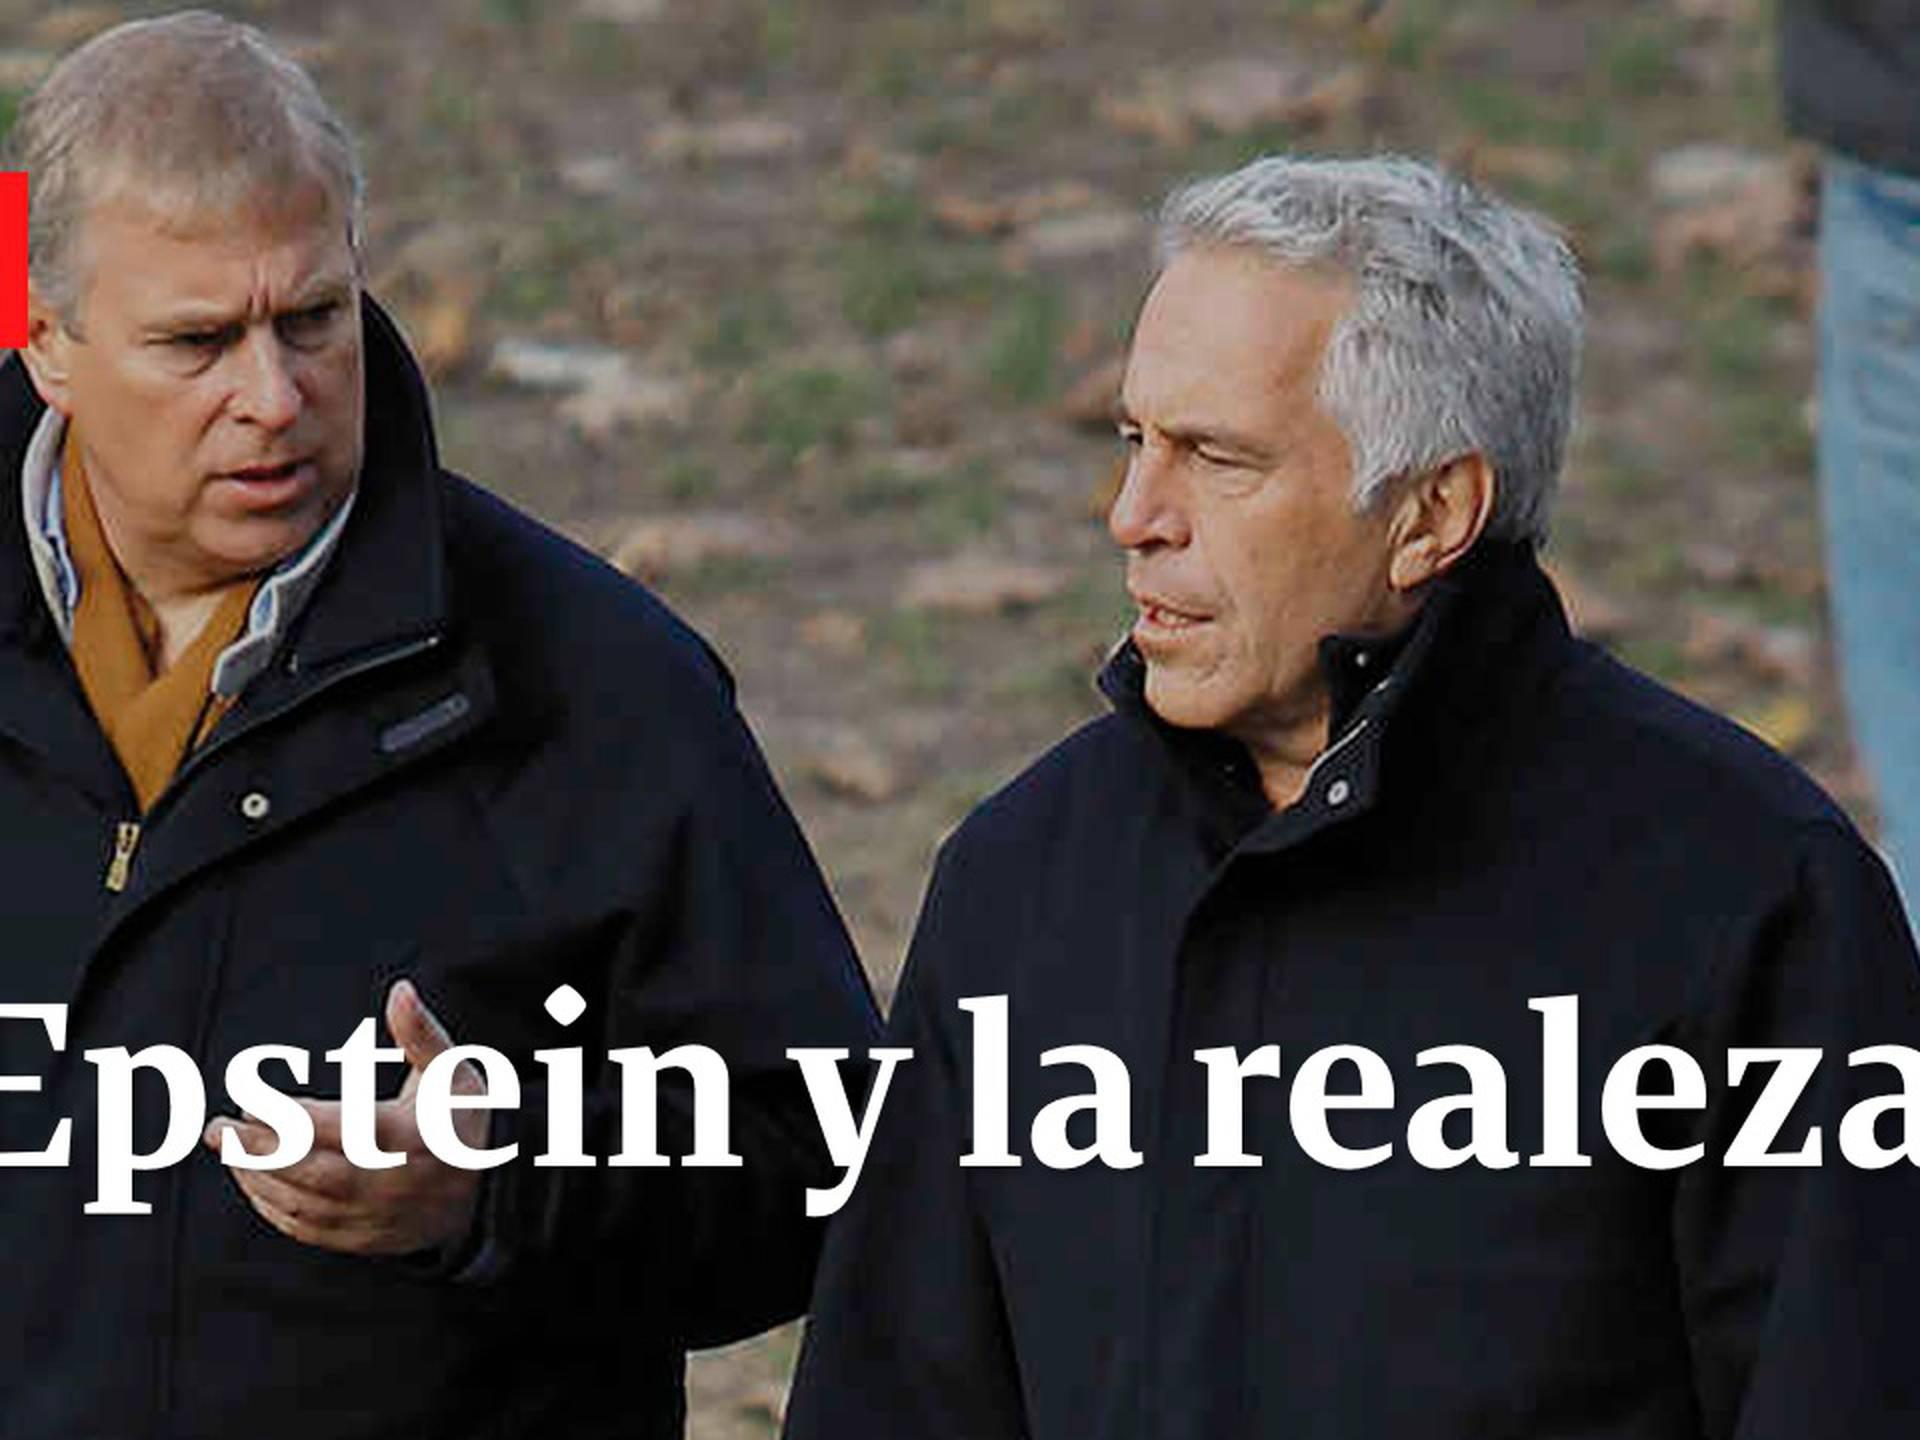 Epstein y la realeza